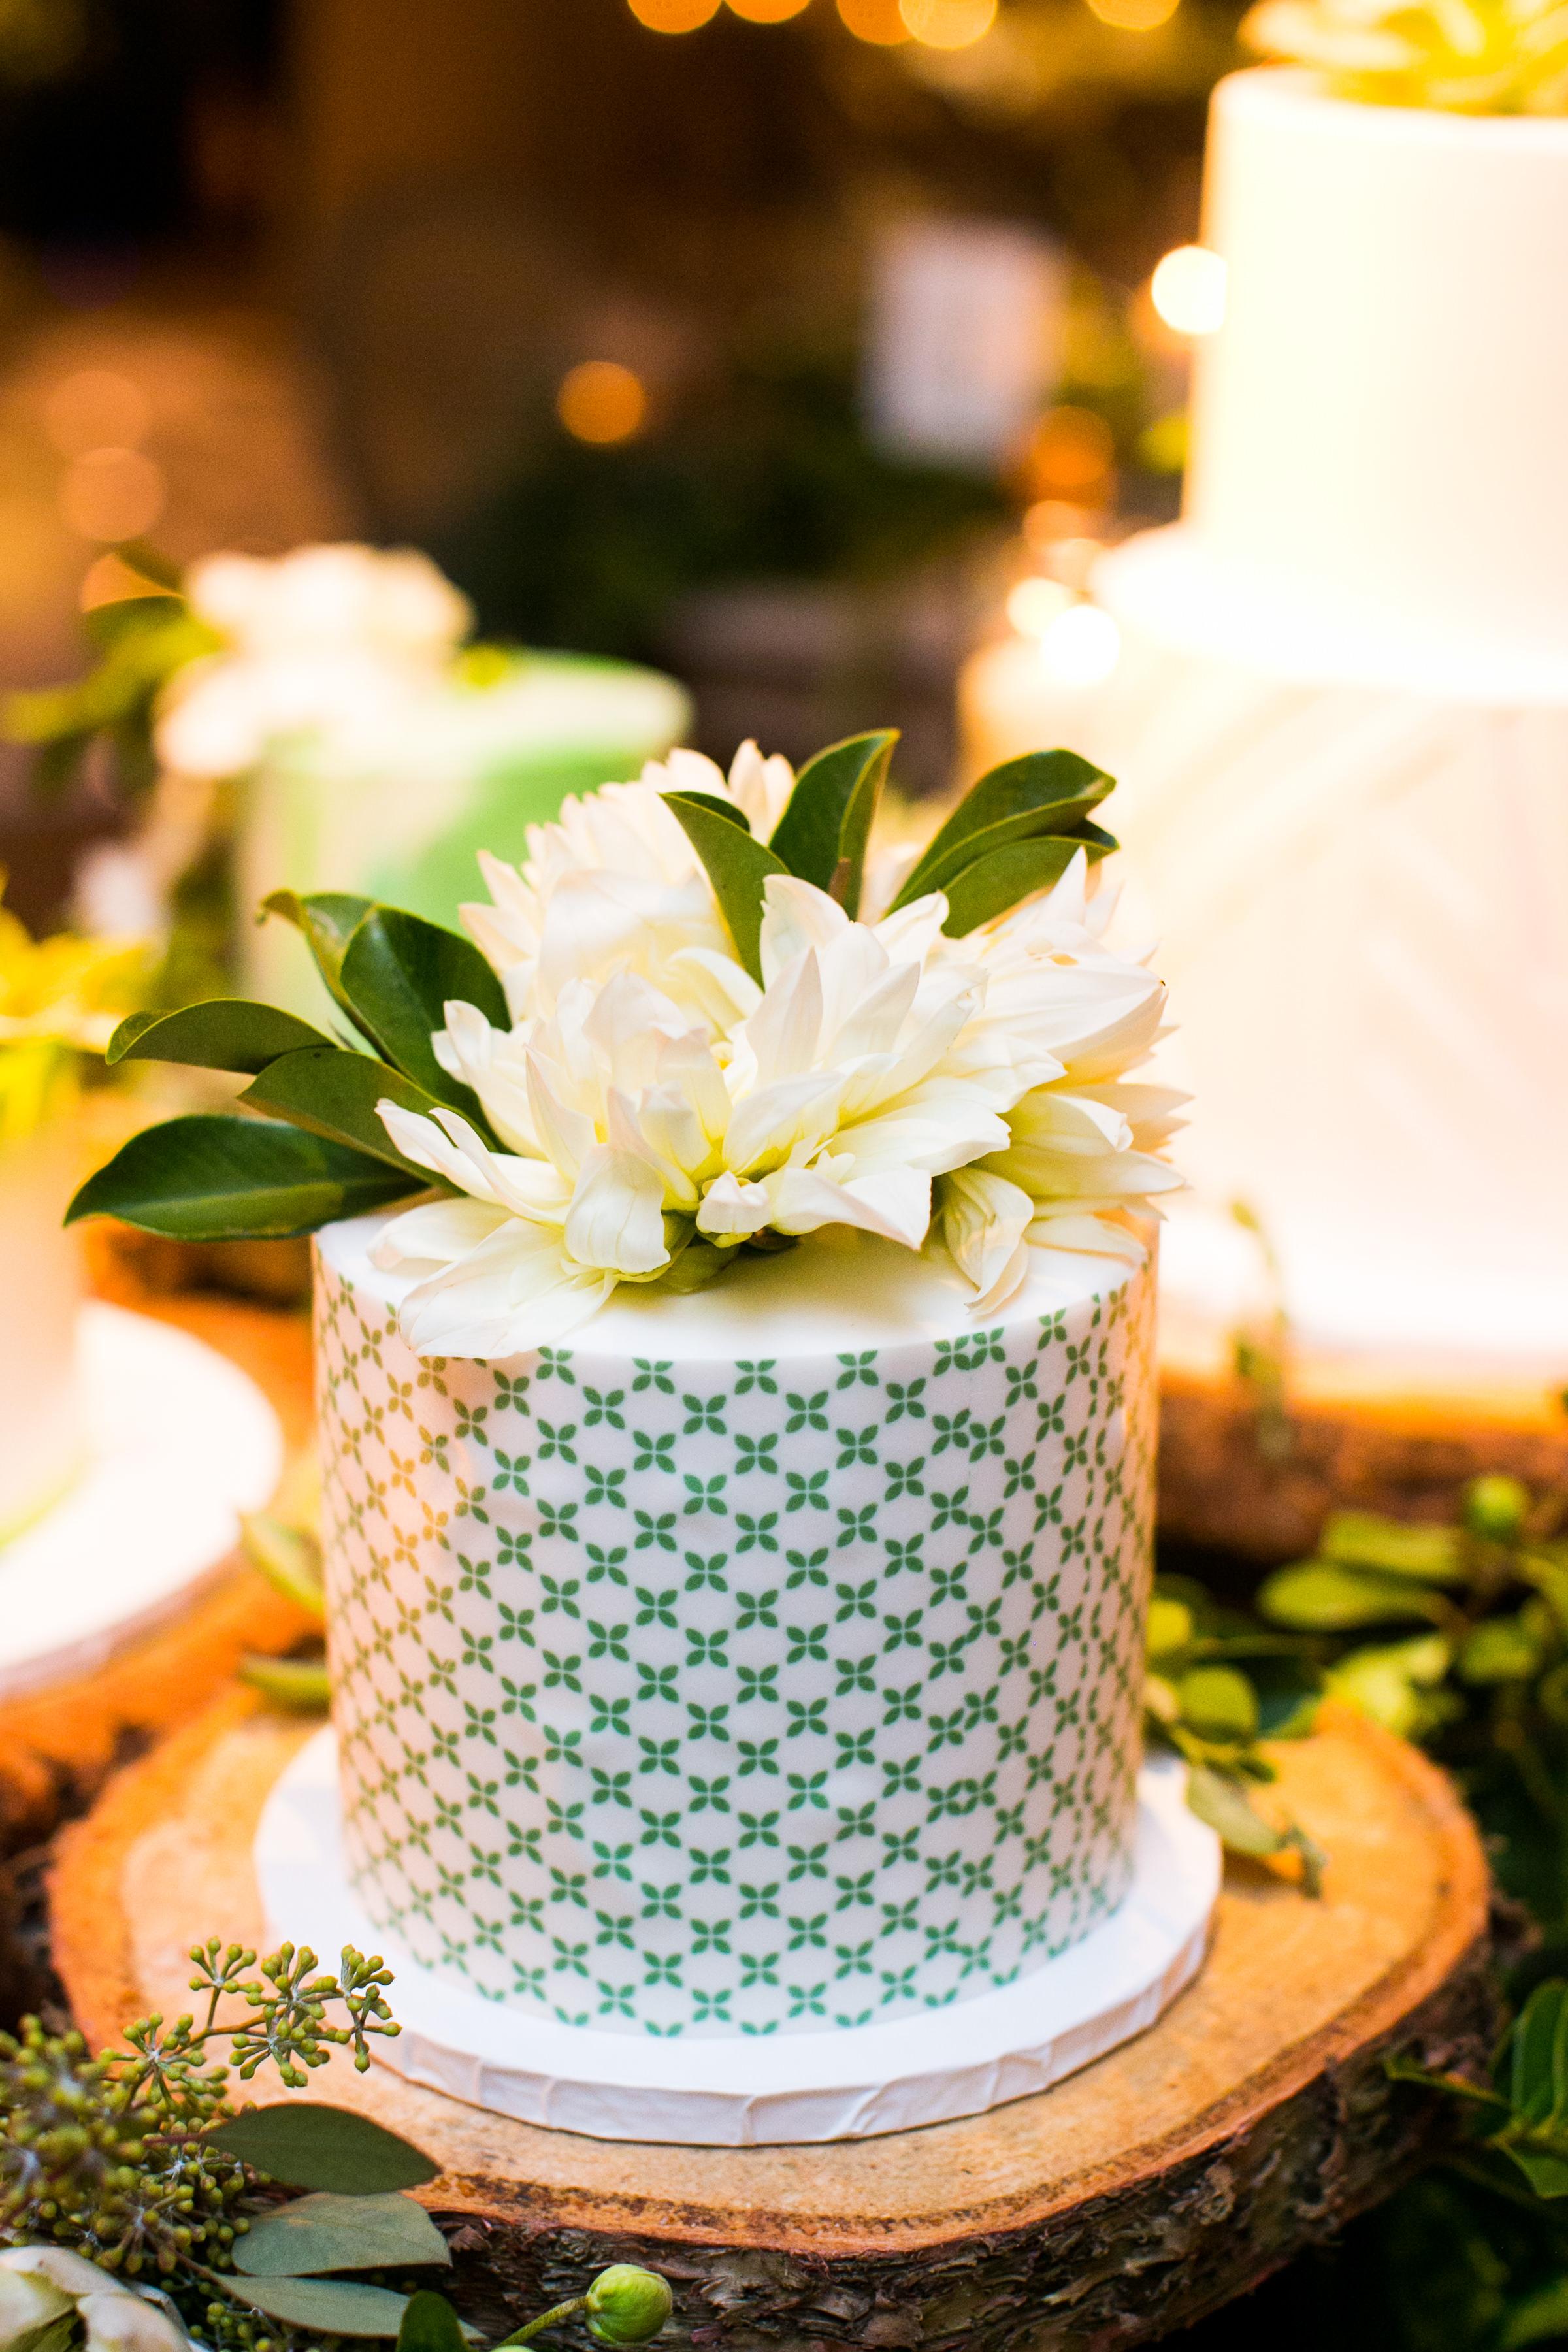 www.santabarbarawedding.com   Four Seasons Santa Barbara   Levine Fox Events   Callaway Gable Photo   Wedding Cake